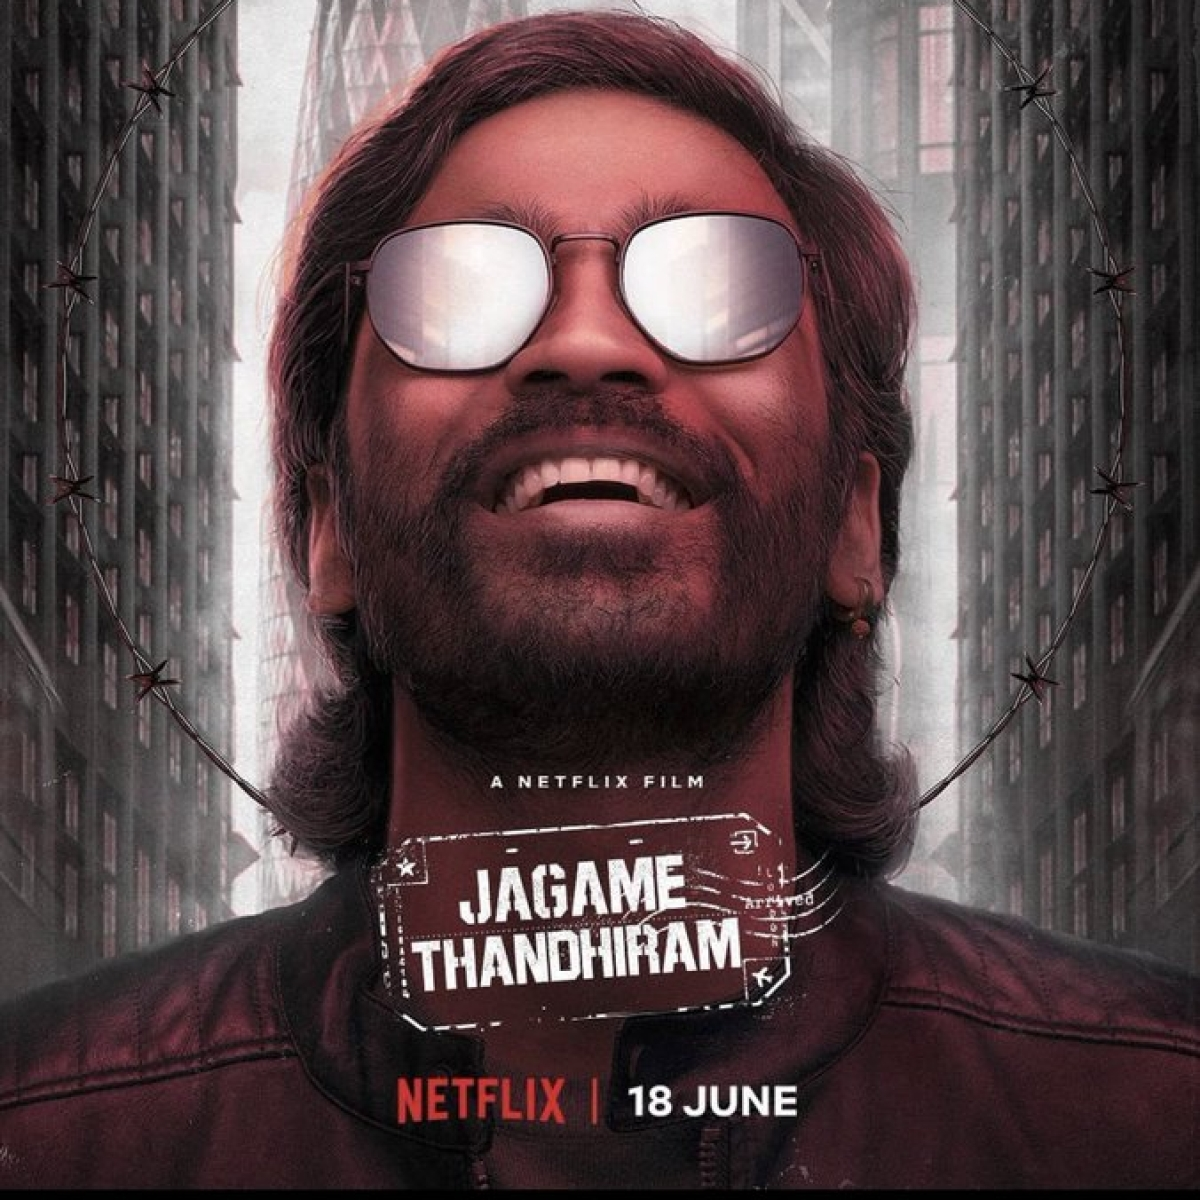 Dhanush-starrer 'Jagame Thandhiram' to release on Netflix on June 18